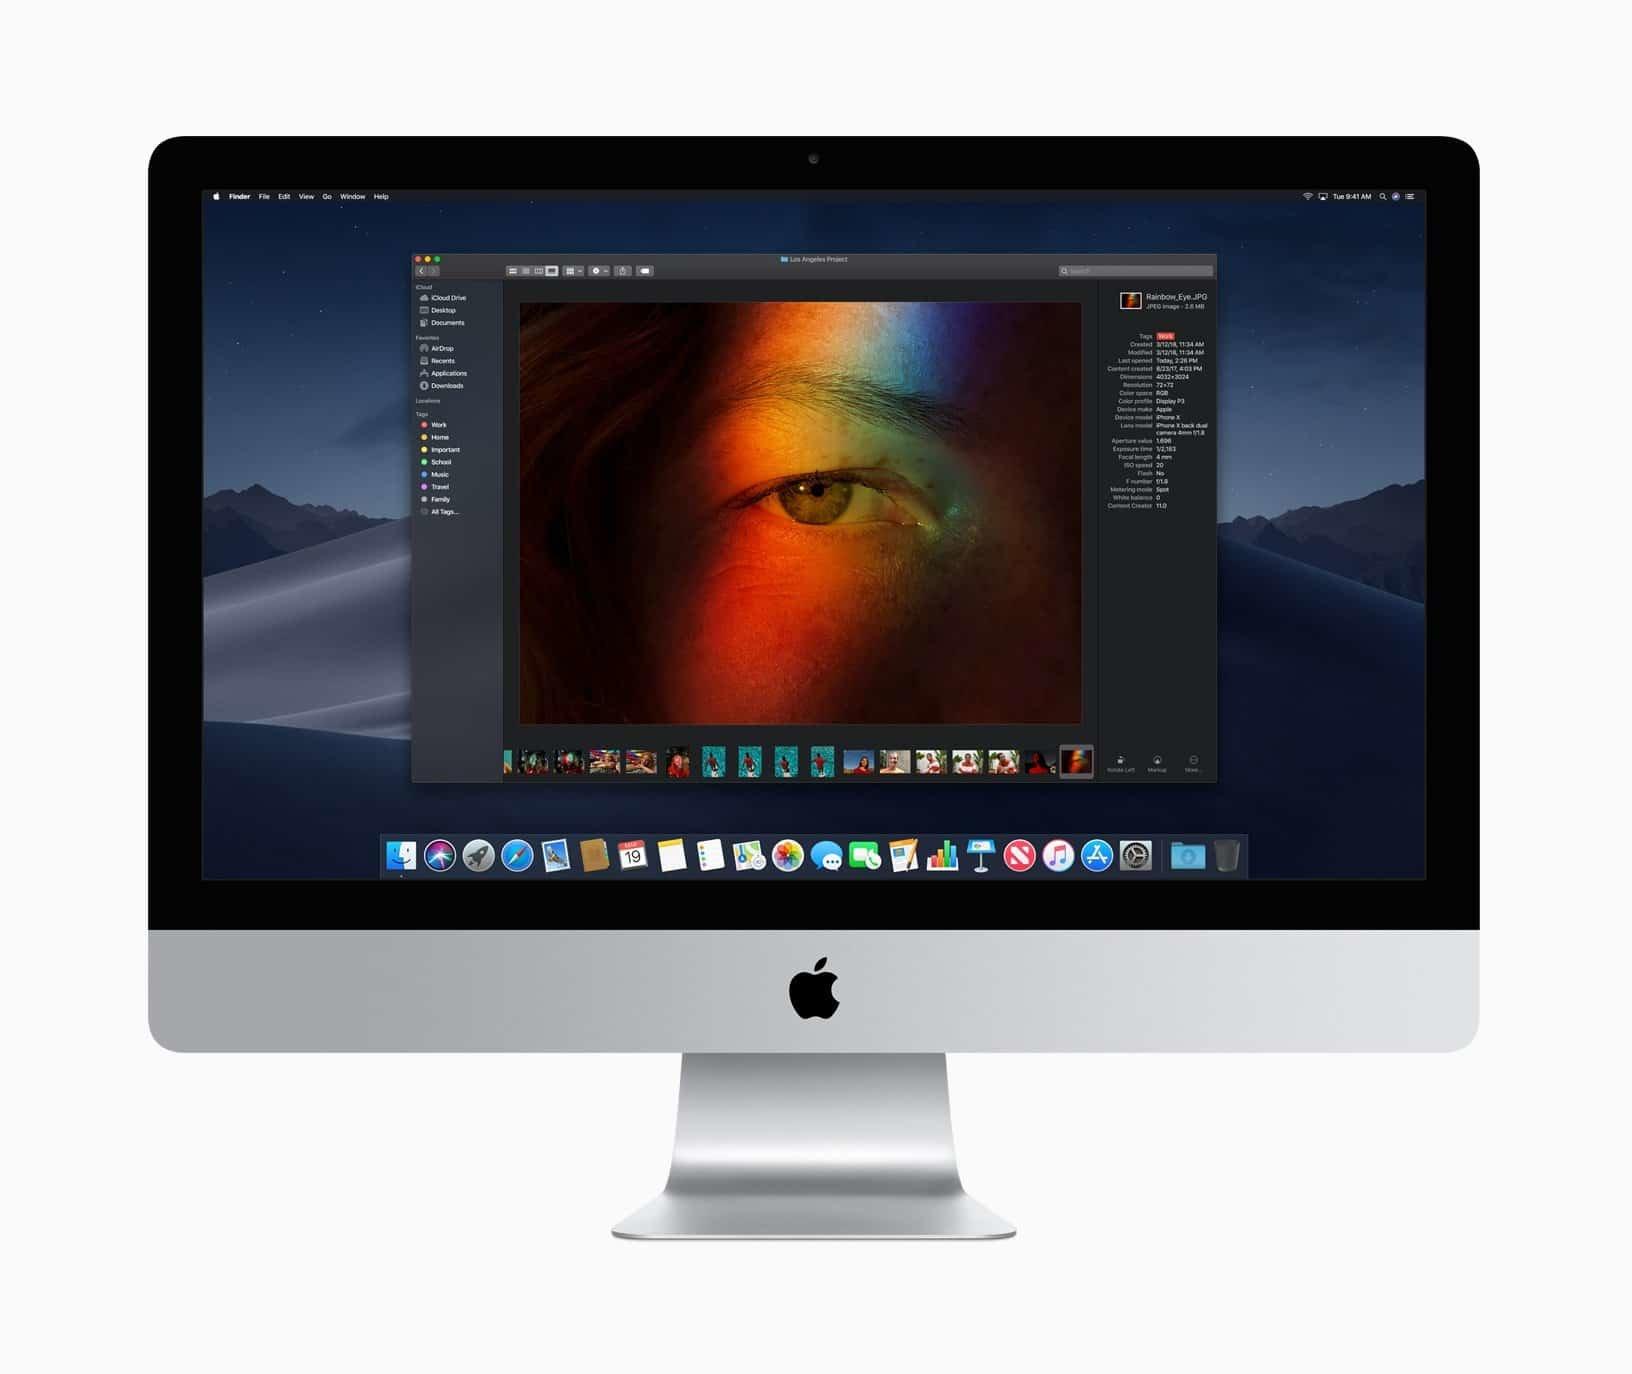 iMac 27 Zoll (03/2019)